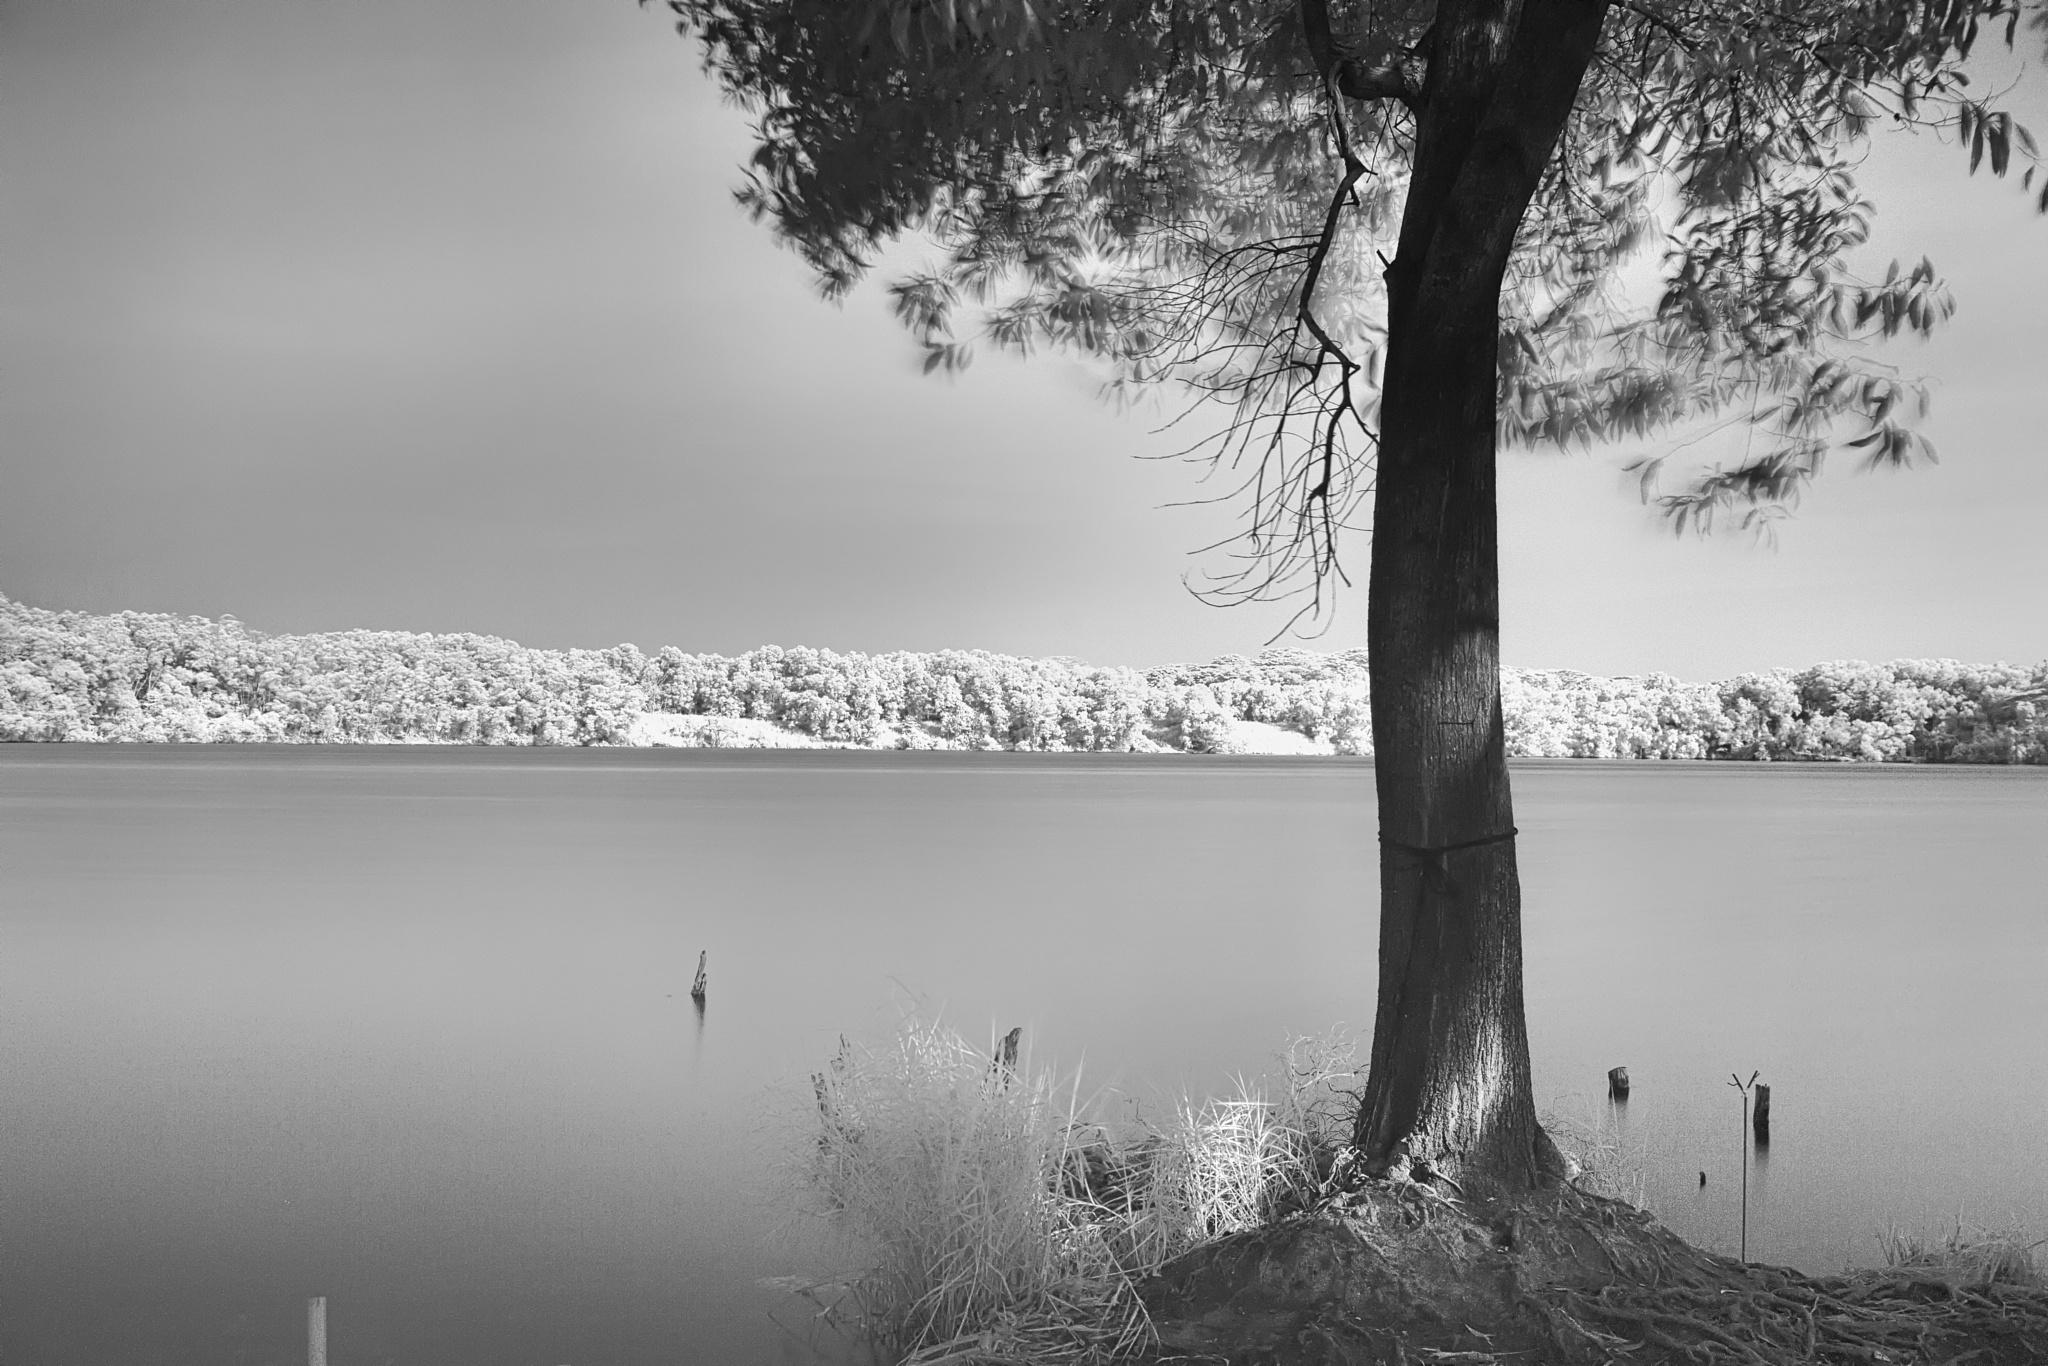 A Tree on the Shore by ravikumarjambunathan